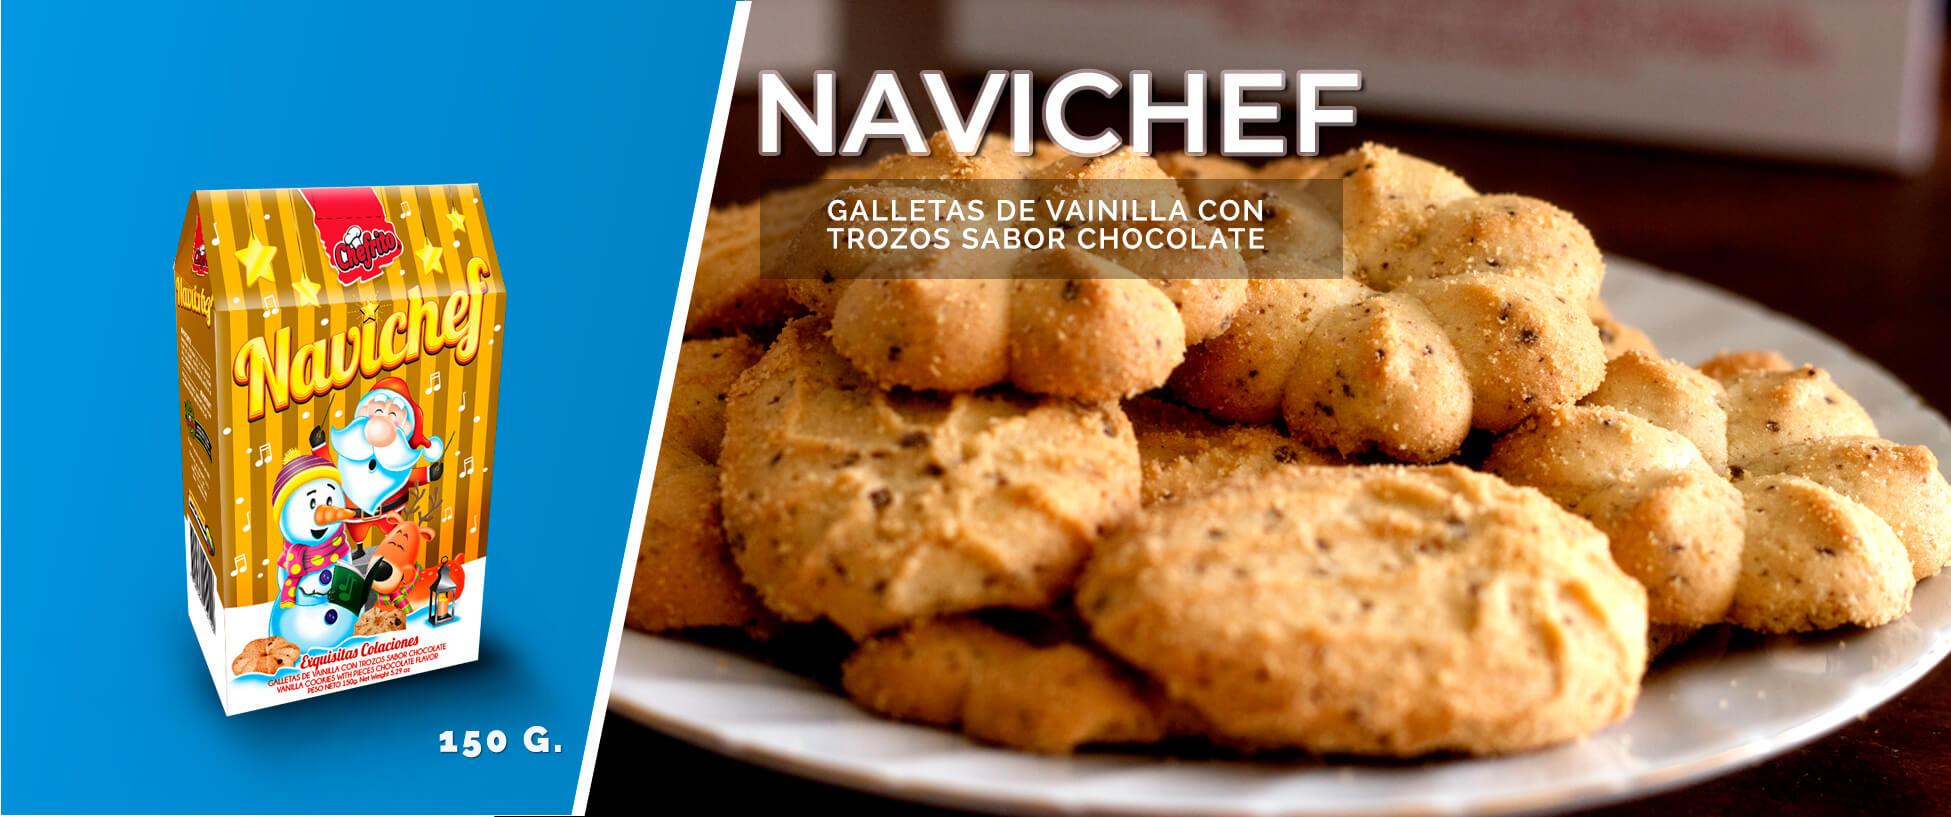 Navichef 4